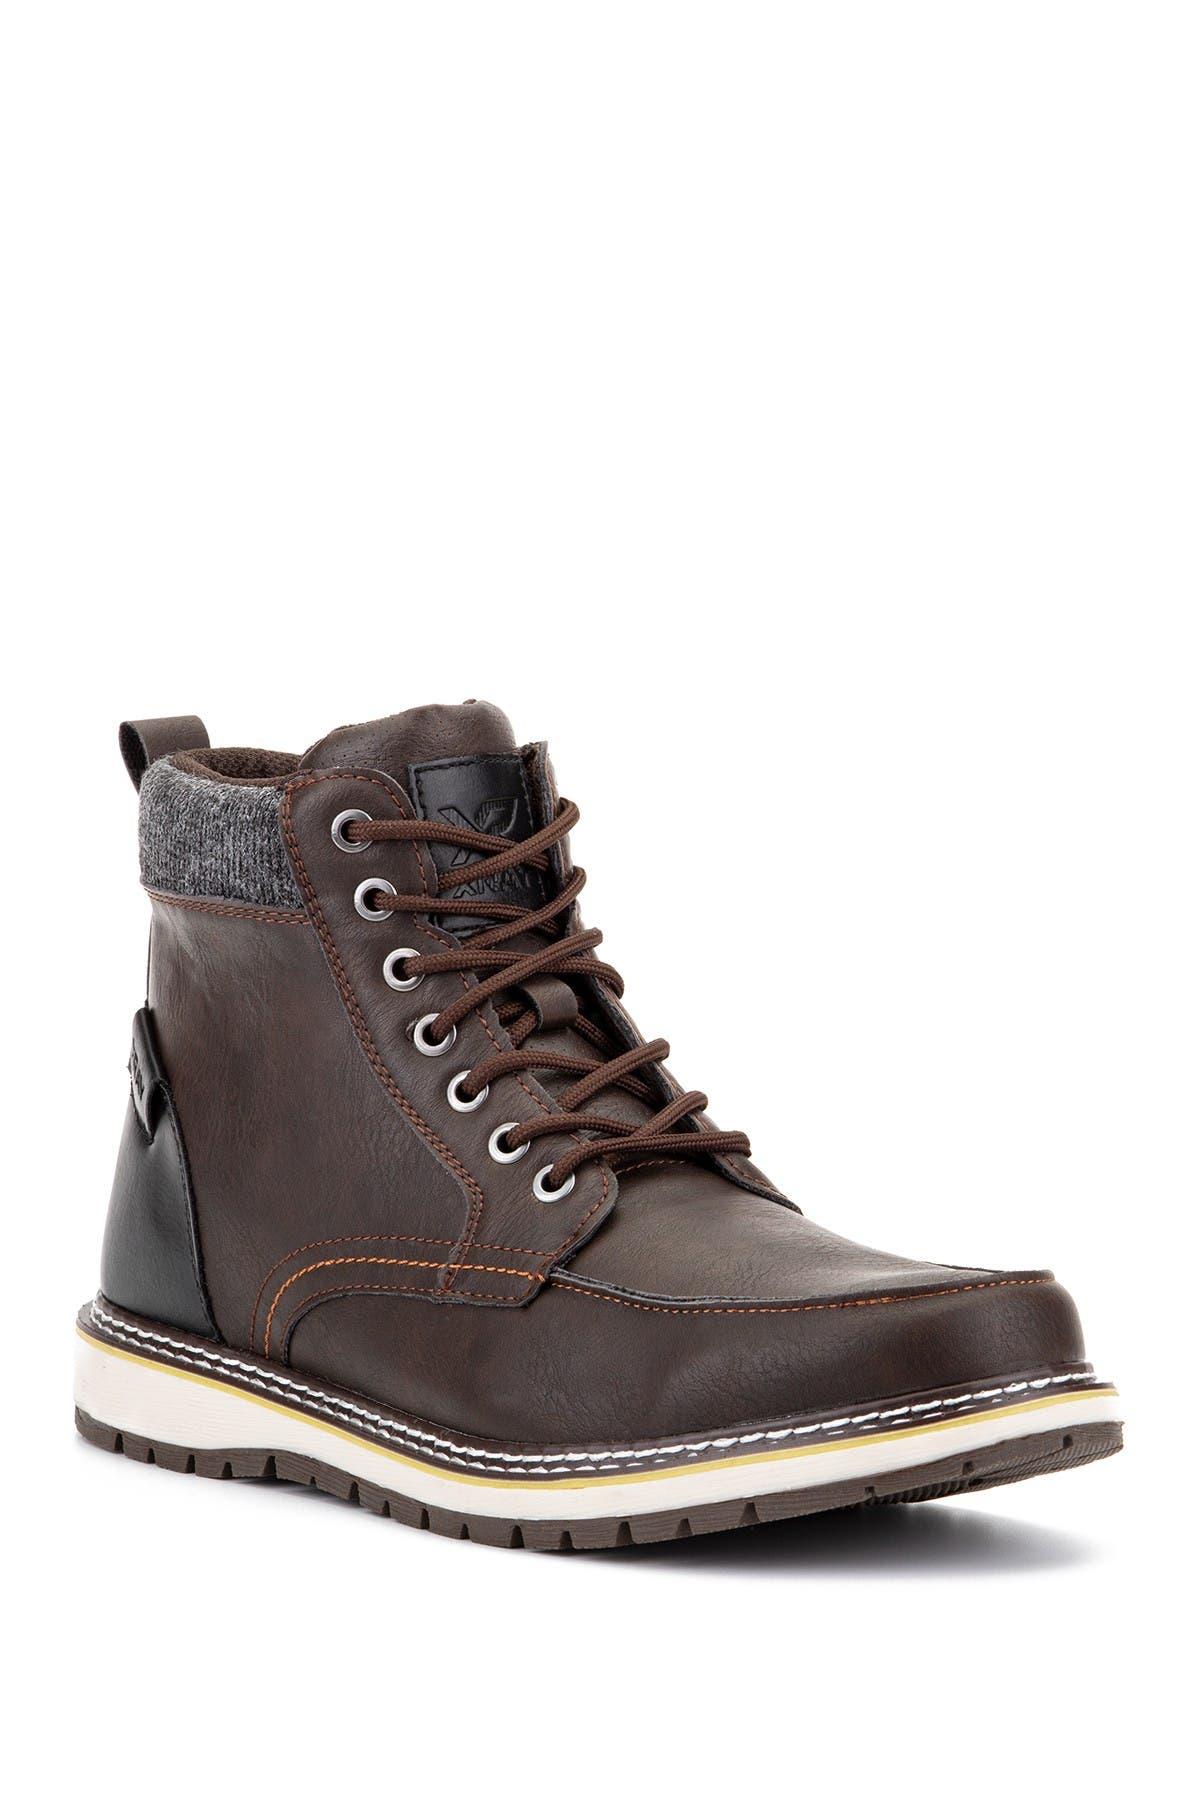 Image of XRAY Nolan Lace-Up Boot